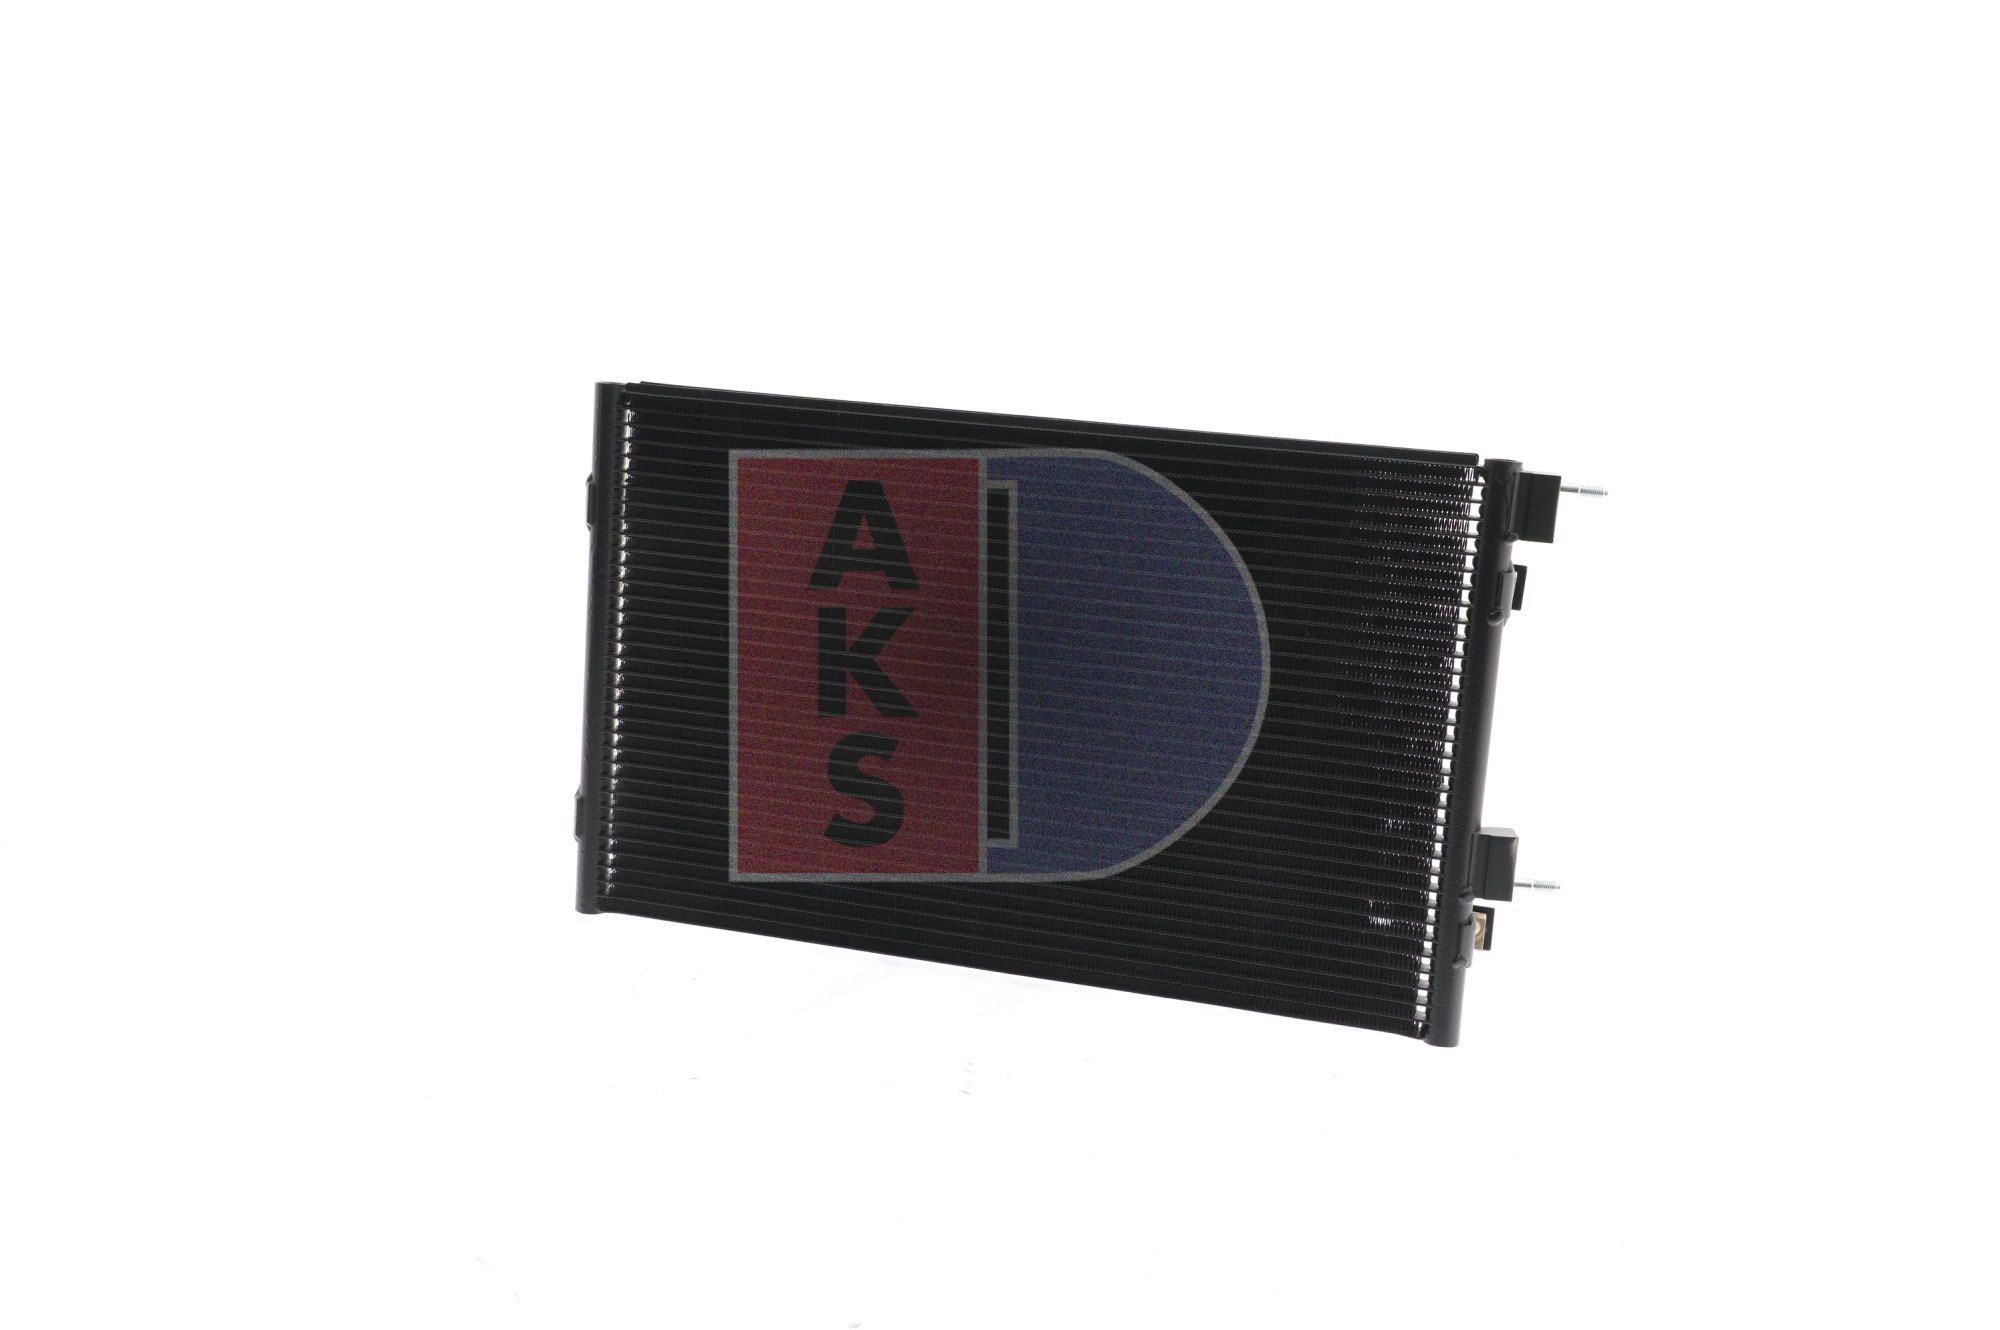 Klimakondensator 522008N AKS DASIS 522008N in Original Qualität